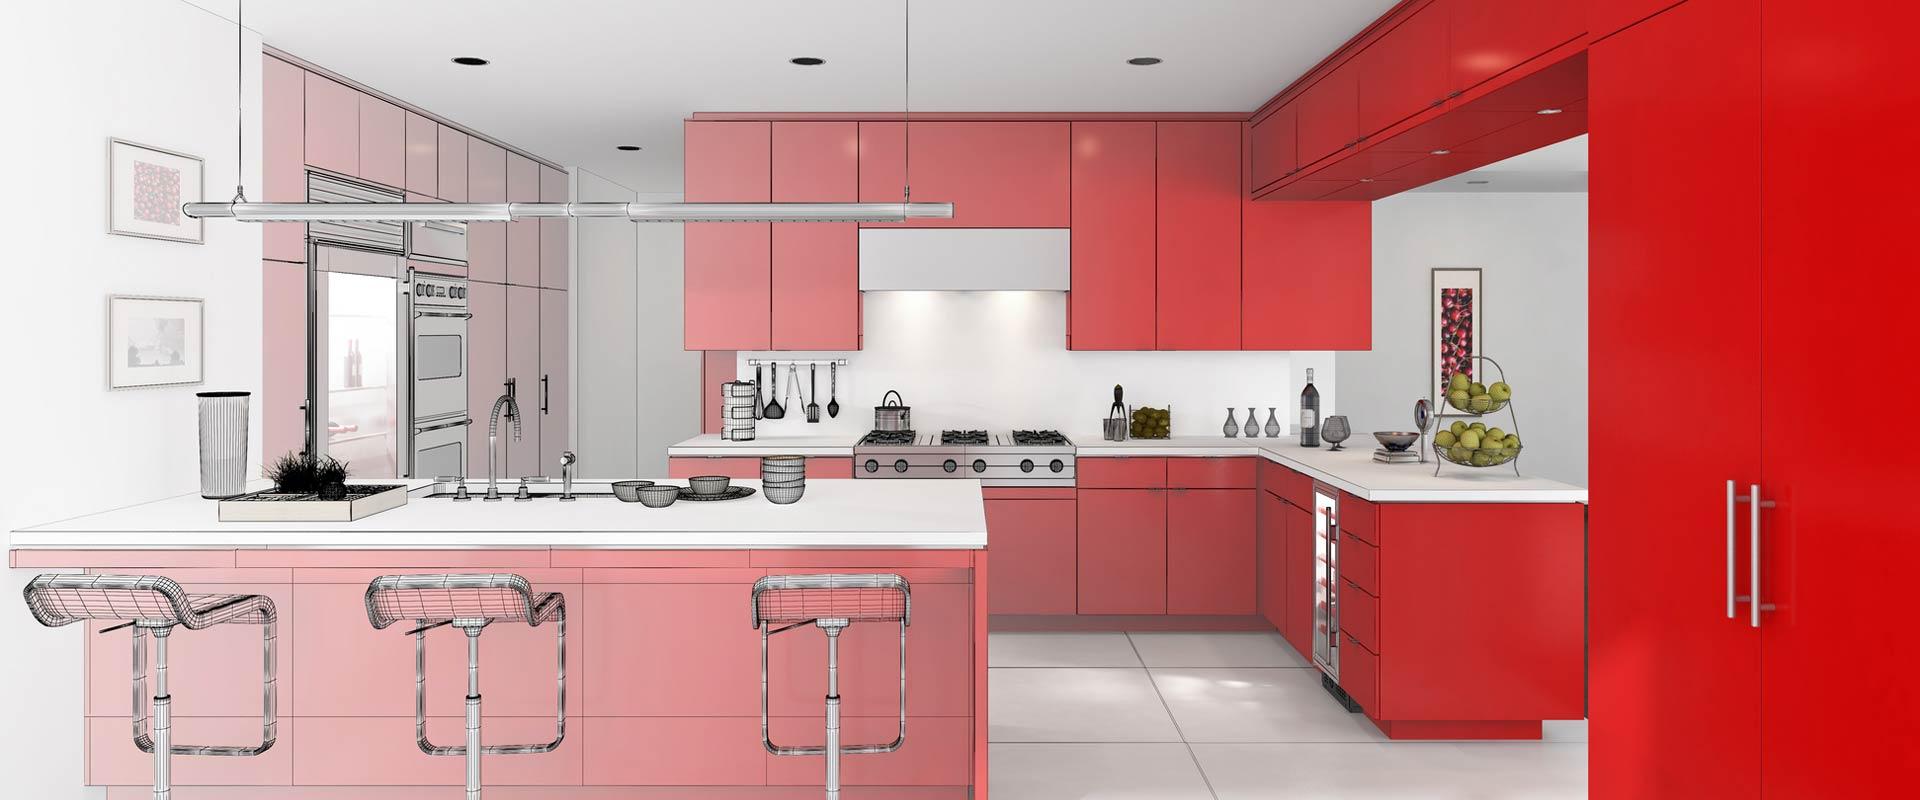 domeyer m bel und k chen individuelle k chenplanung. Black Bedroom Furniture Sets. Home Design Ideas